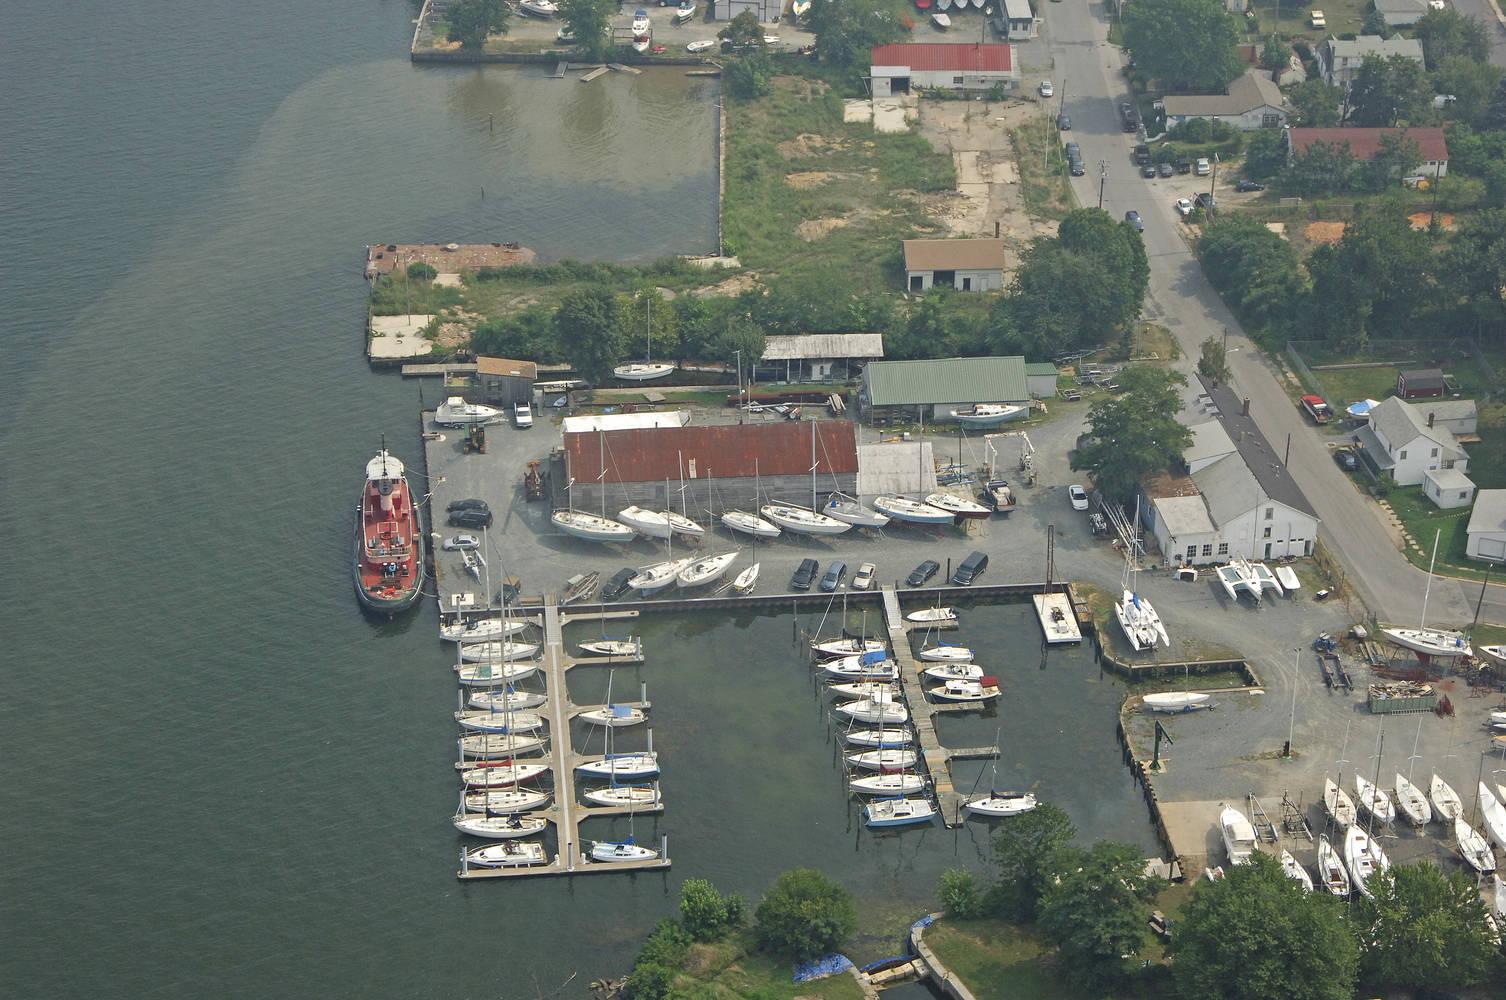 Havre De Grace Marina at Water Street slip, dock, mooring